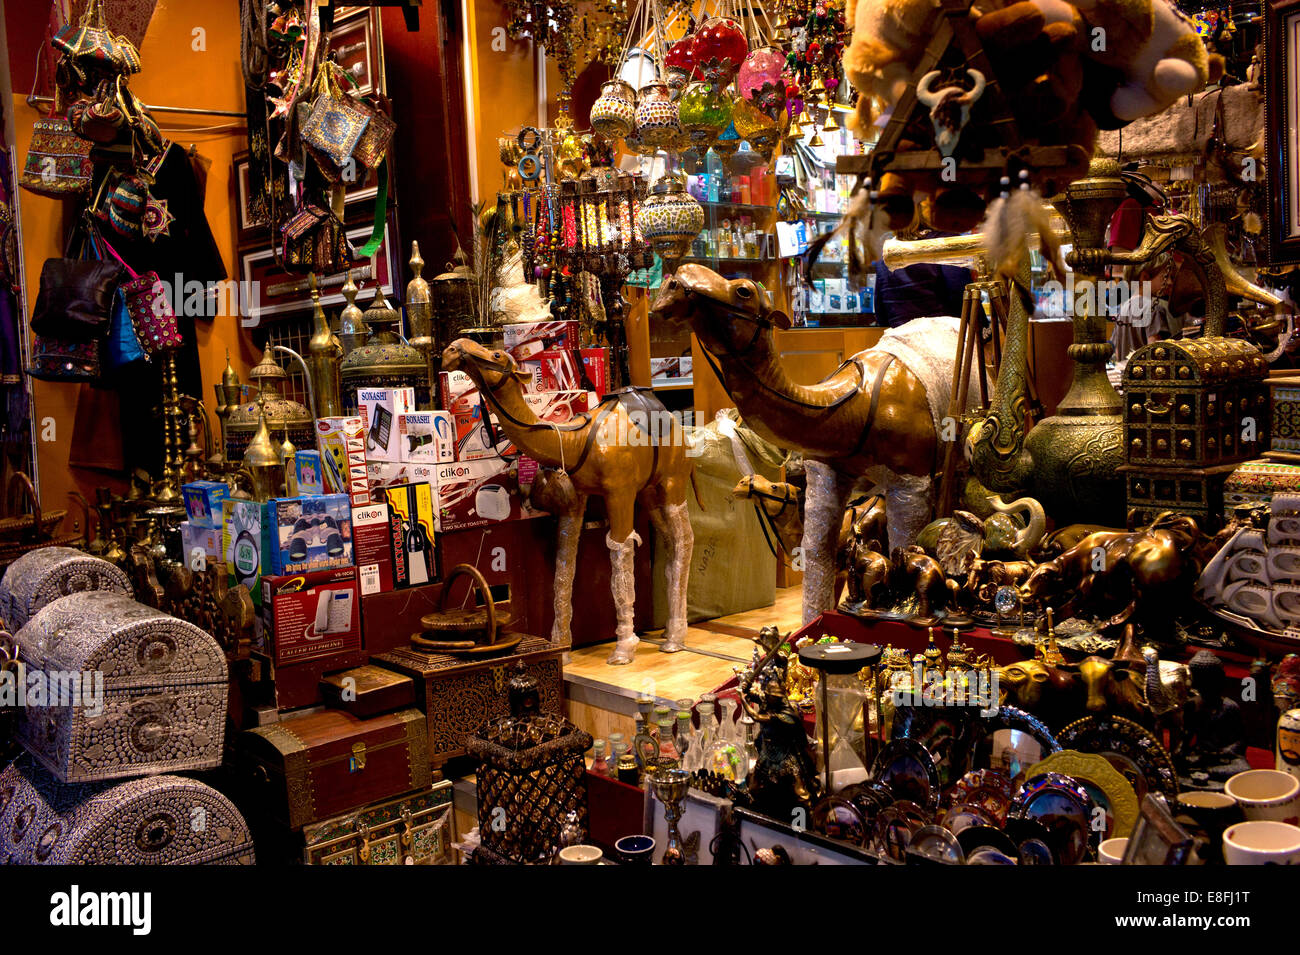 Oman, Muscat Mutrah souk tradizionali bazaar Immagini Stock